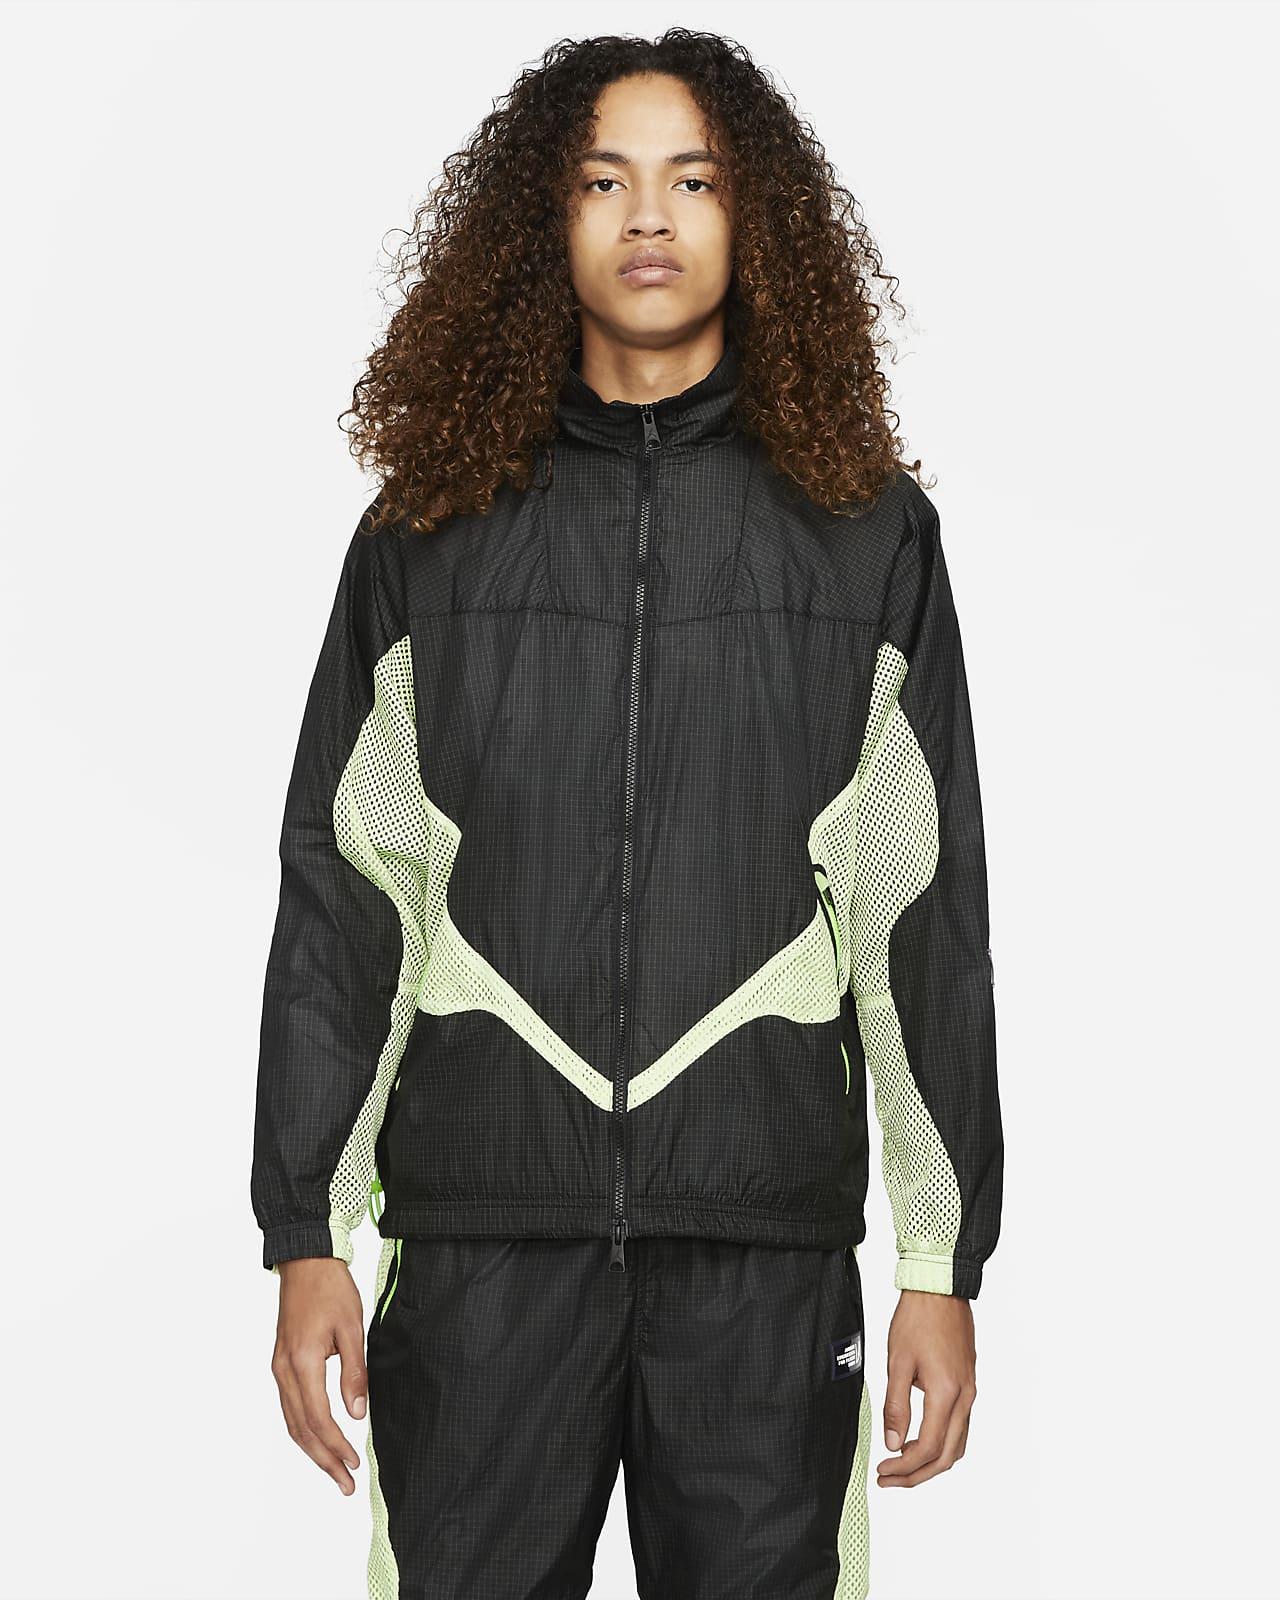 Jordan 23 Engineered Men's Tracksuit Jacket